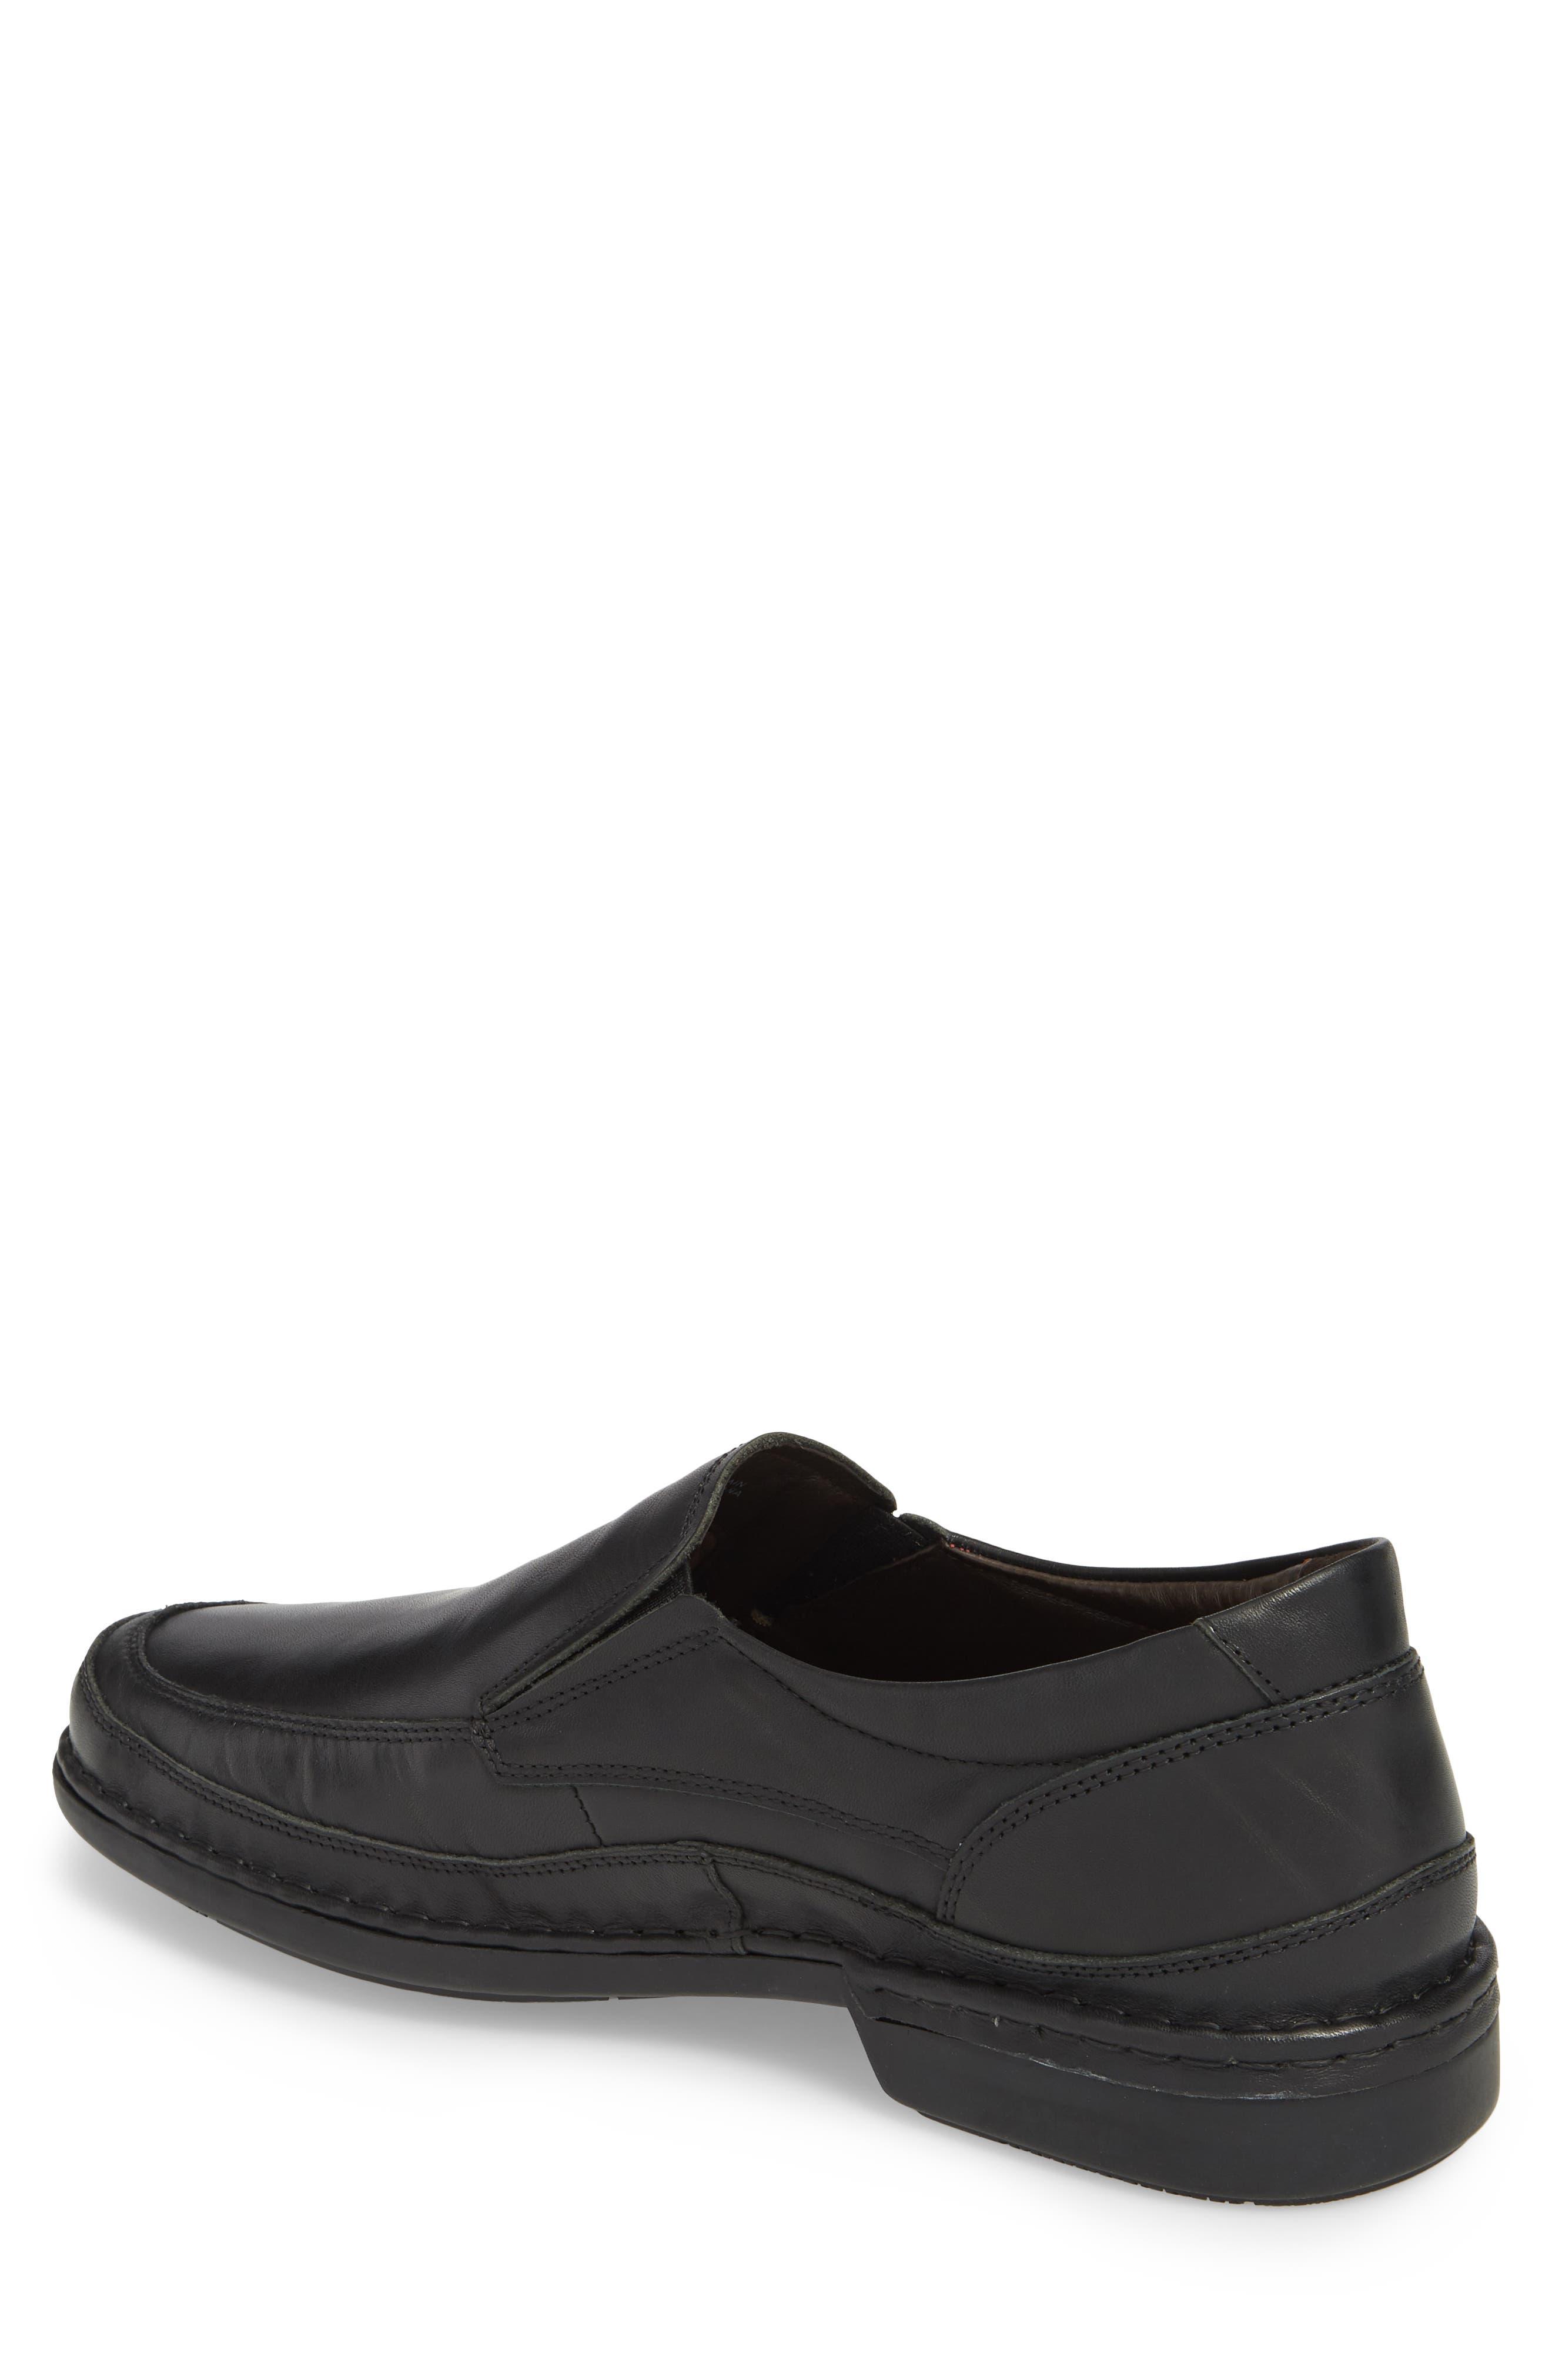 'Oviedo' Slip-On,                             Alternate thumbnail 2, color,                             Black Leather